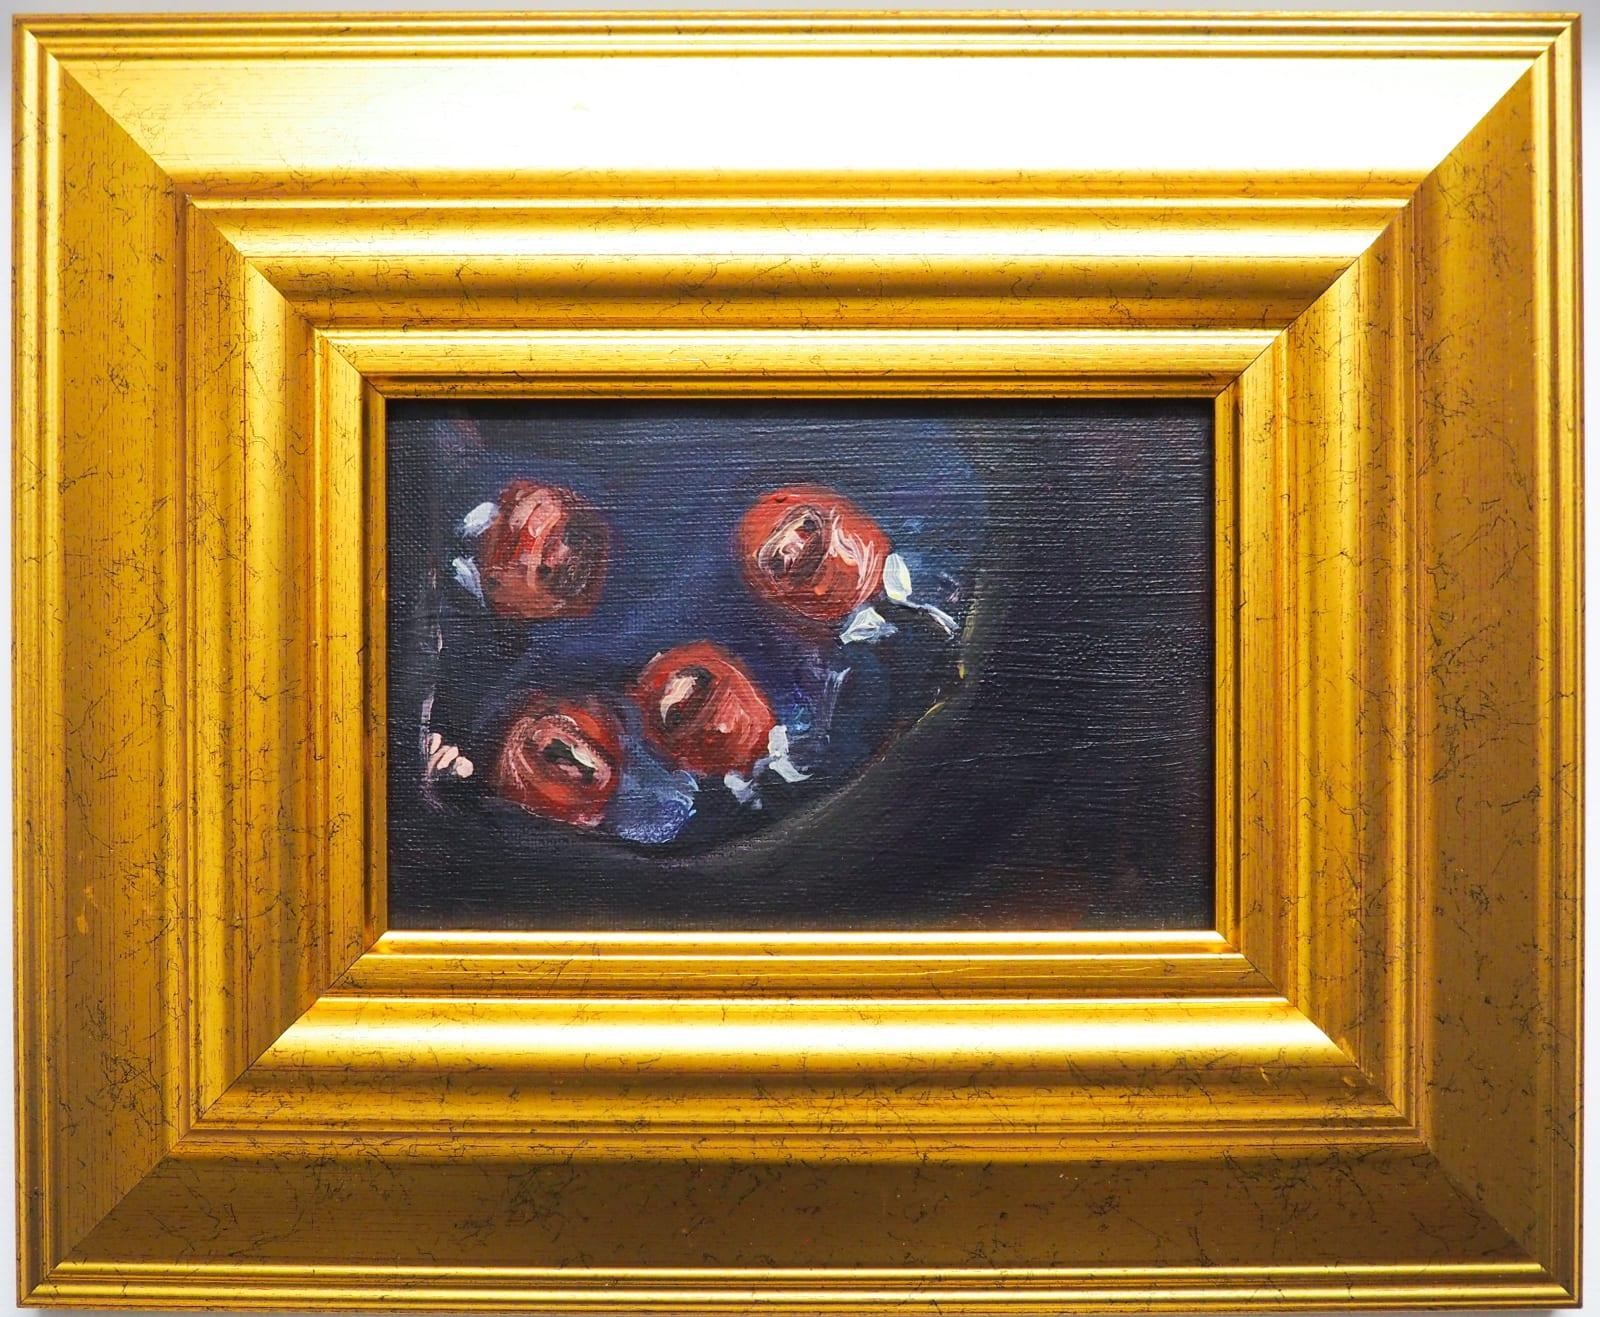 Yassine Balbzioui, message from underground, 2018 Oil on canvas 33.3 x 27.3 cm (framed)